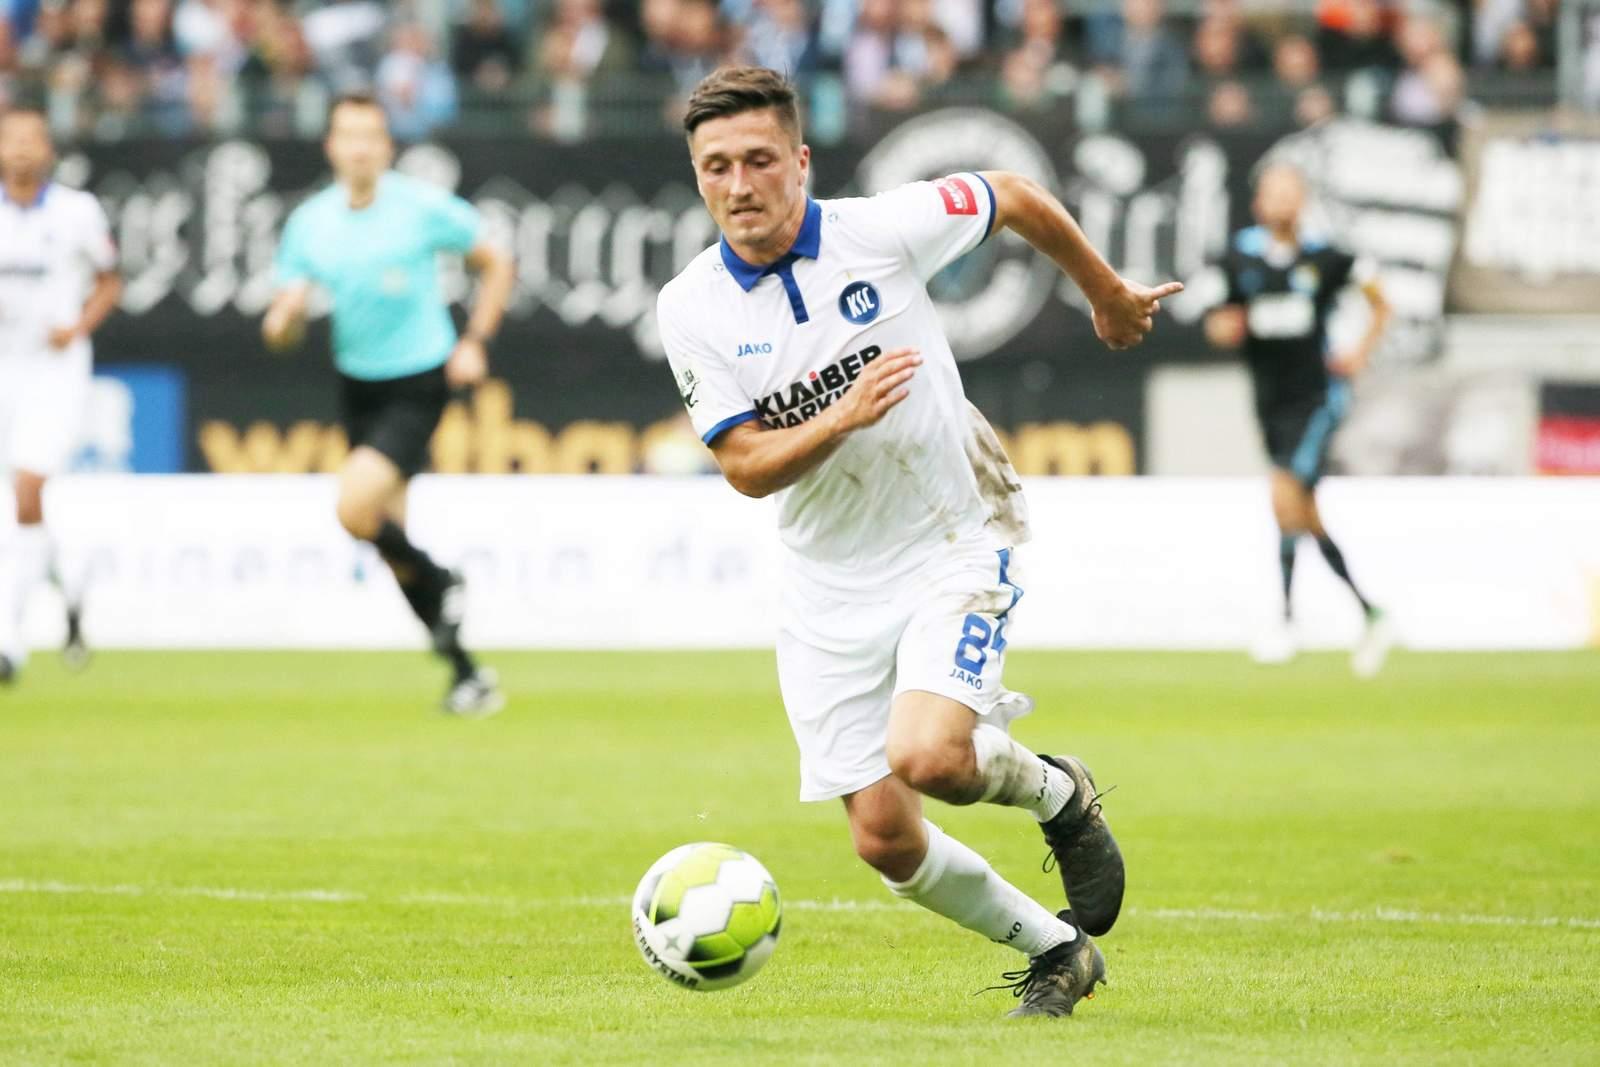 Marcel Mehlem am Ball für den KSC